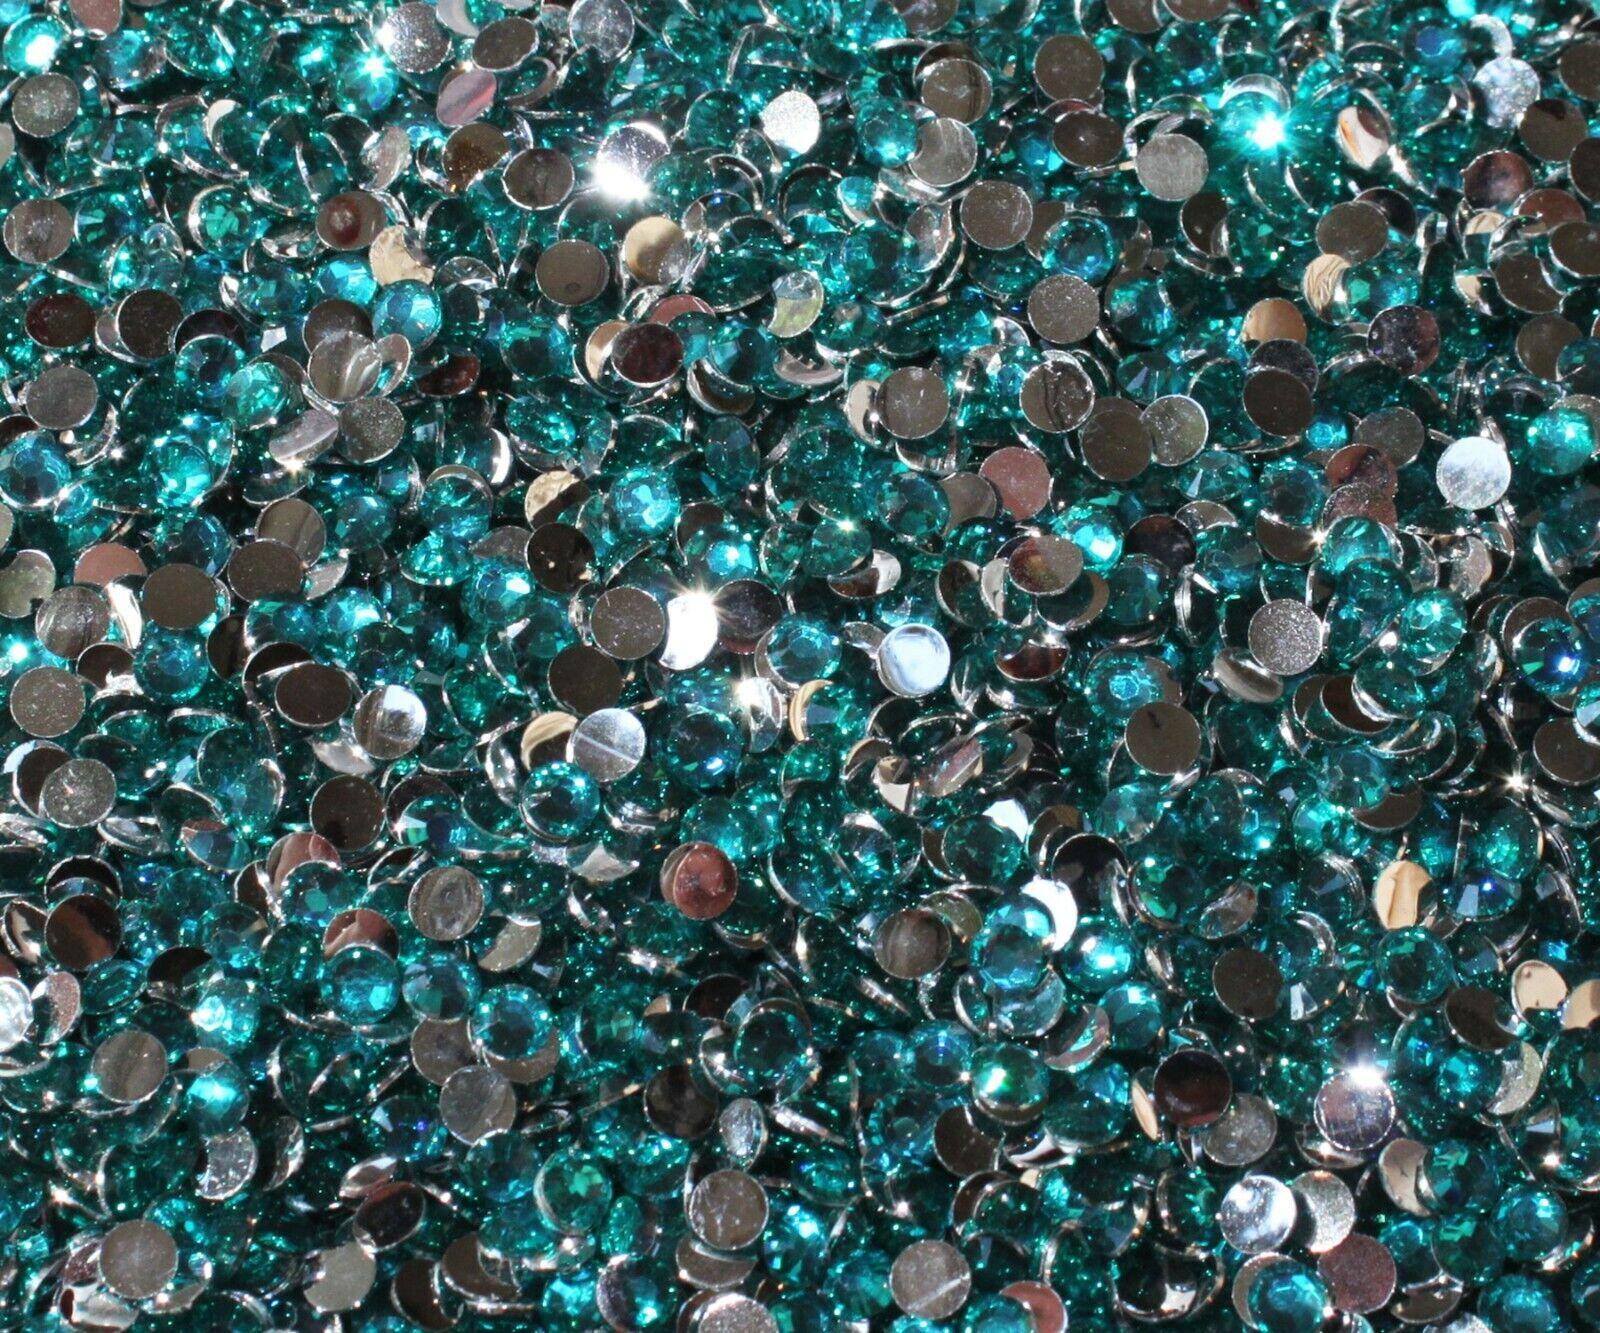 1000 Crystal Flat Back Resin Rhinestones Gems 60 colors, 2mm, 3mm, 4mm, 5mm, 6.5 CAPRI BLUE